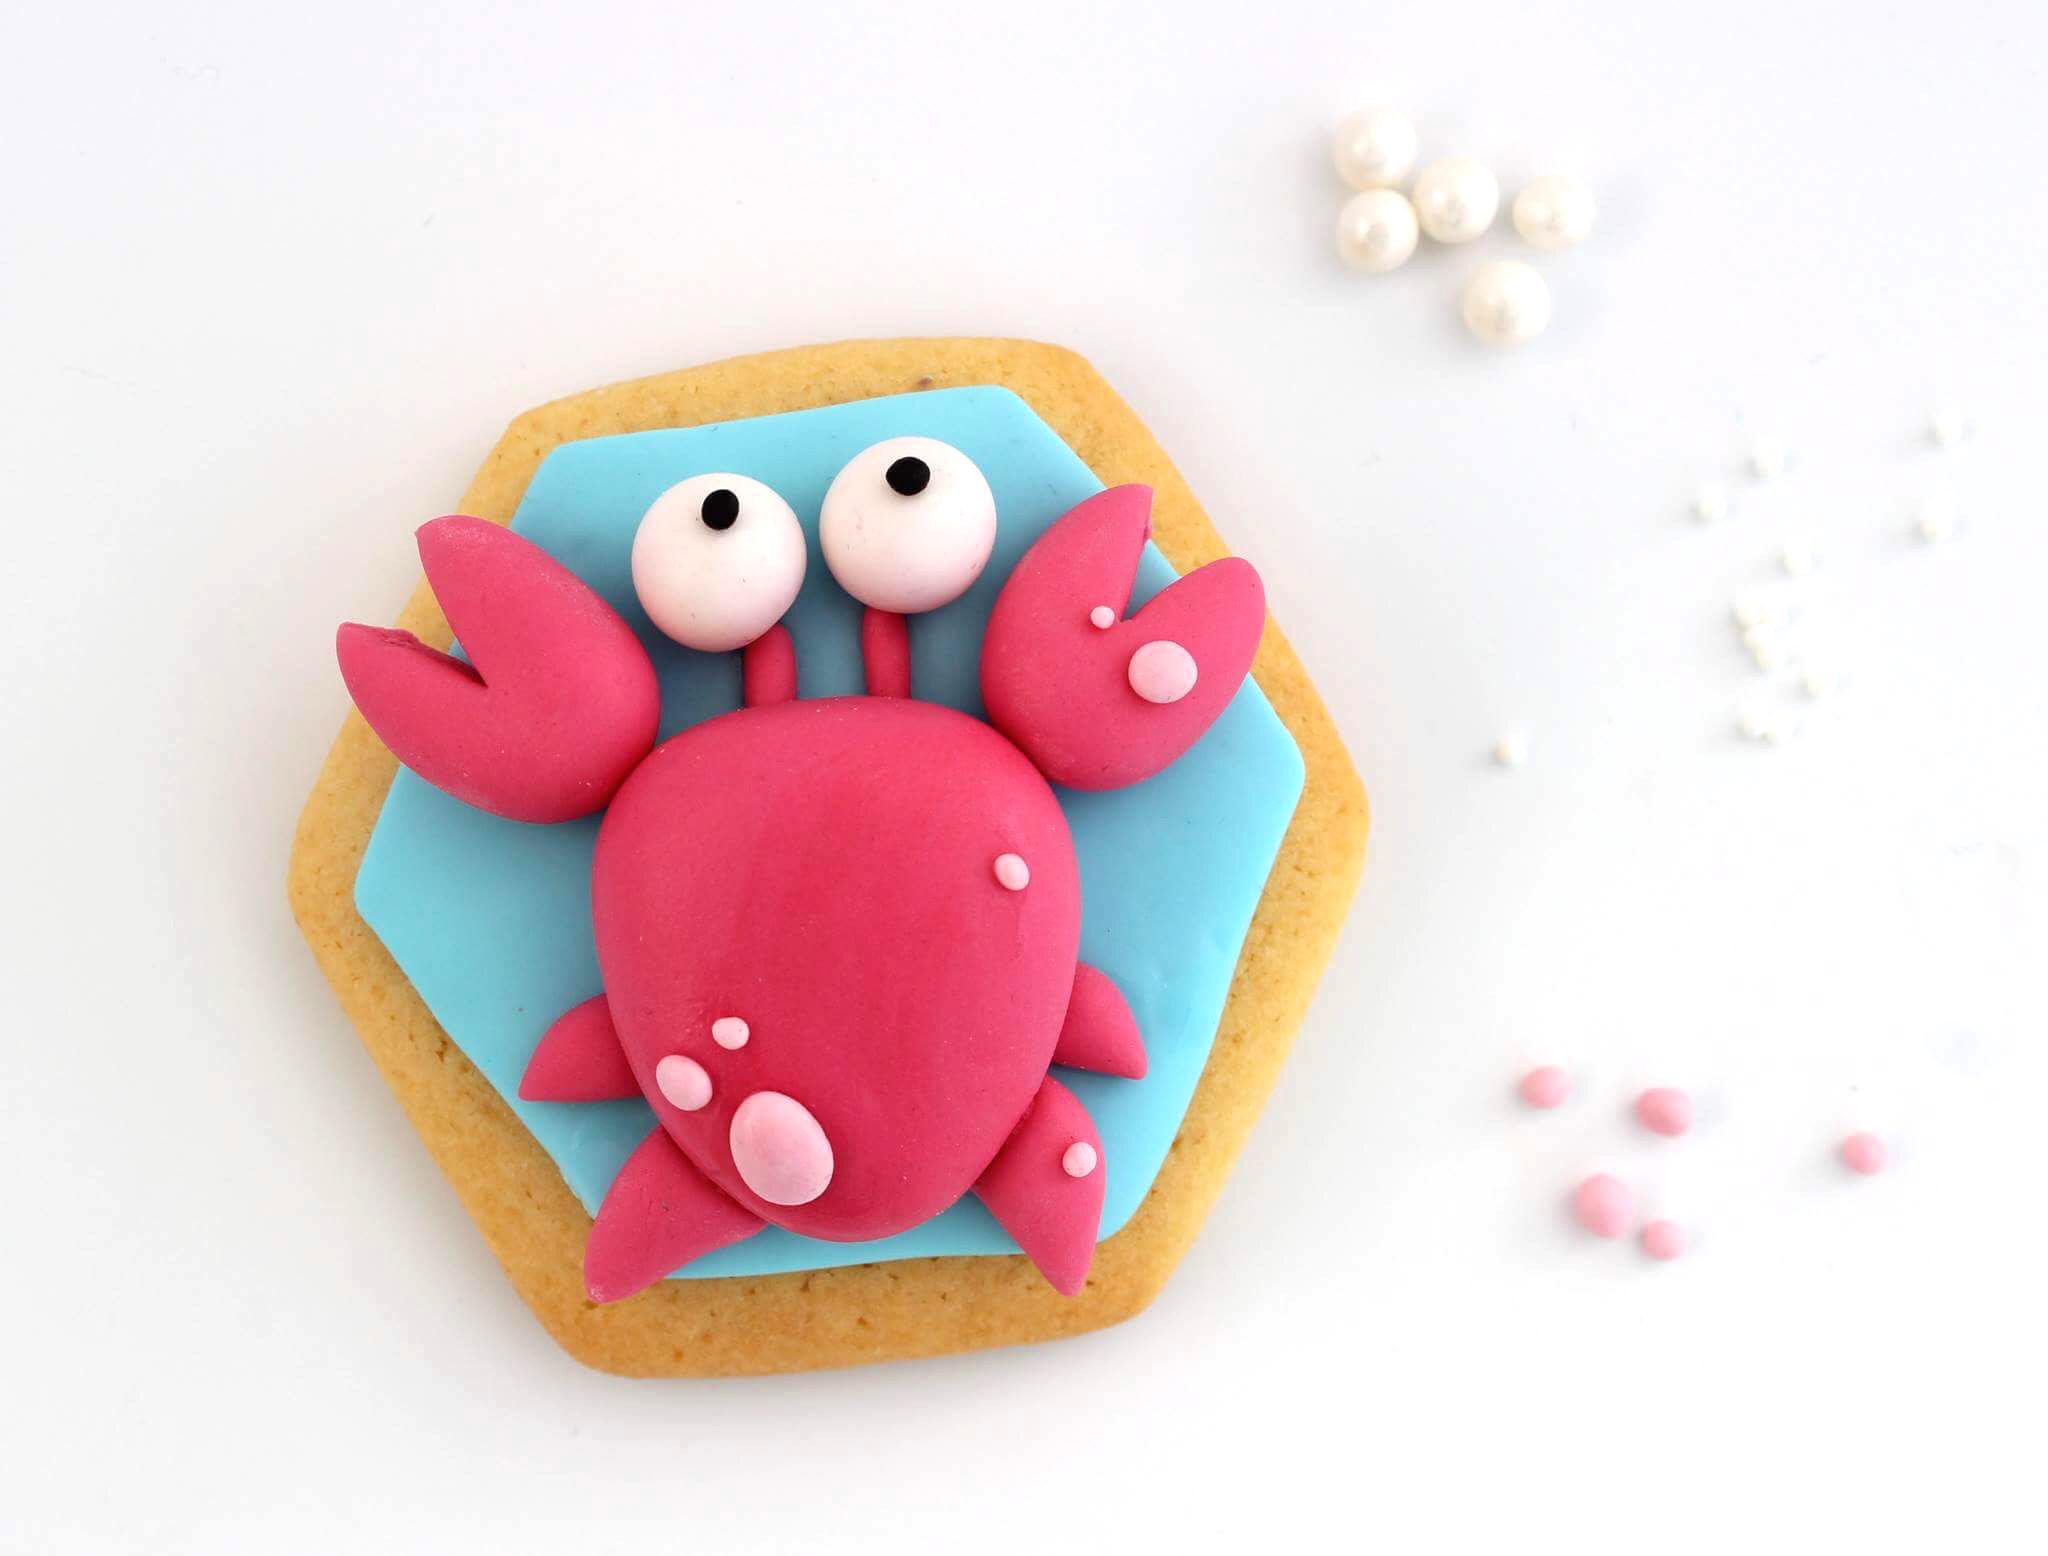 sff17_CrabTutorial-Monique-Ascanelli-The-Cake-Topper-Step5.JPG#asset:17076